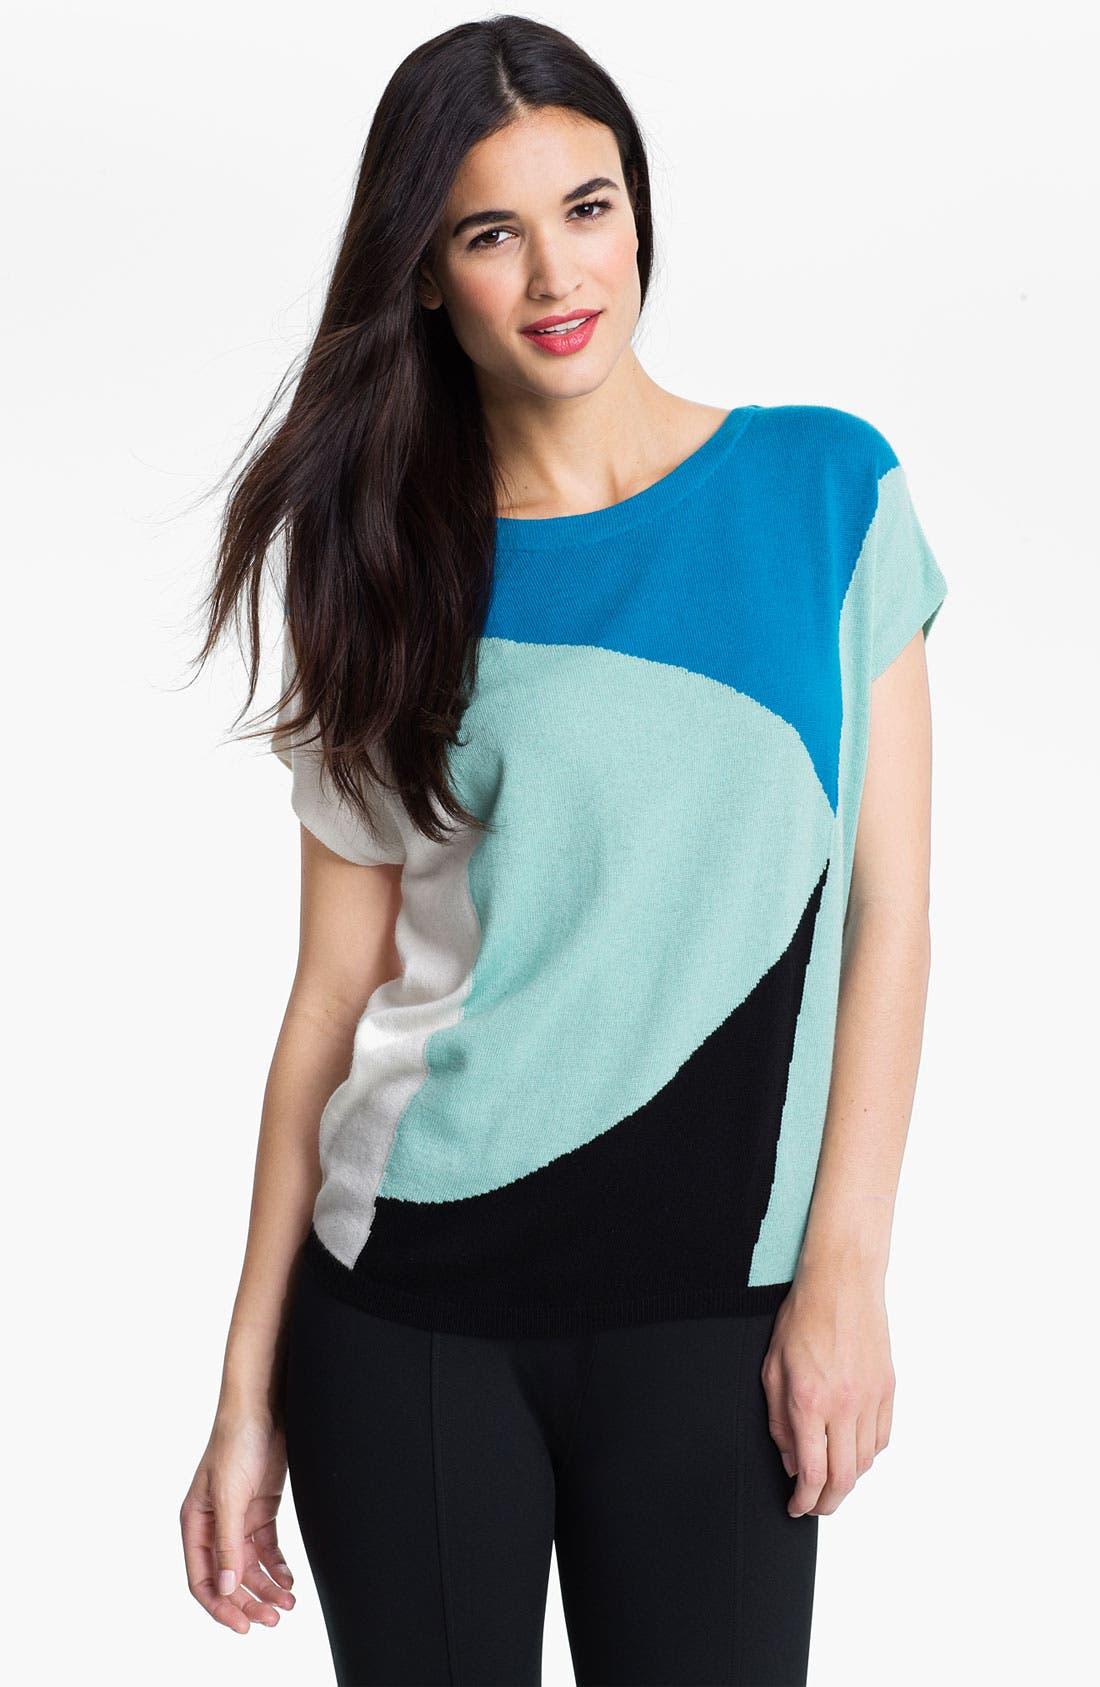 Alternate Image 1 Selected - Vince Camuto Bateau Neck Colorblock Sweater